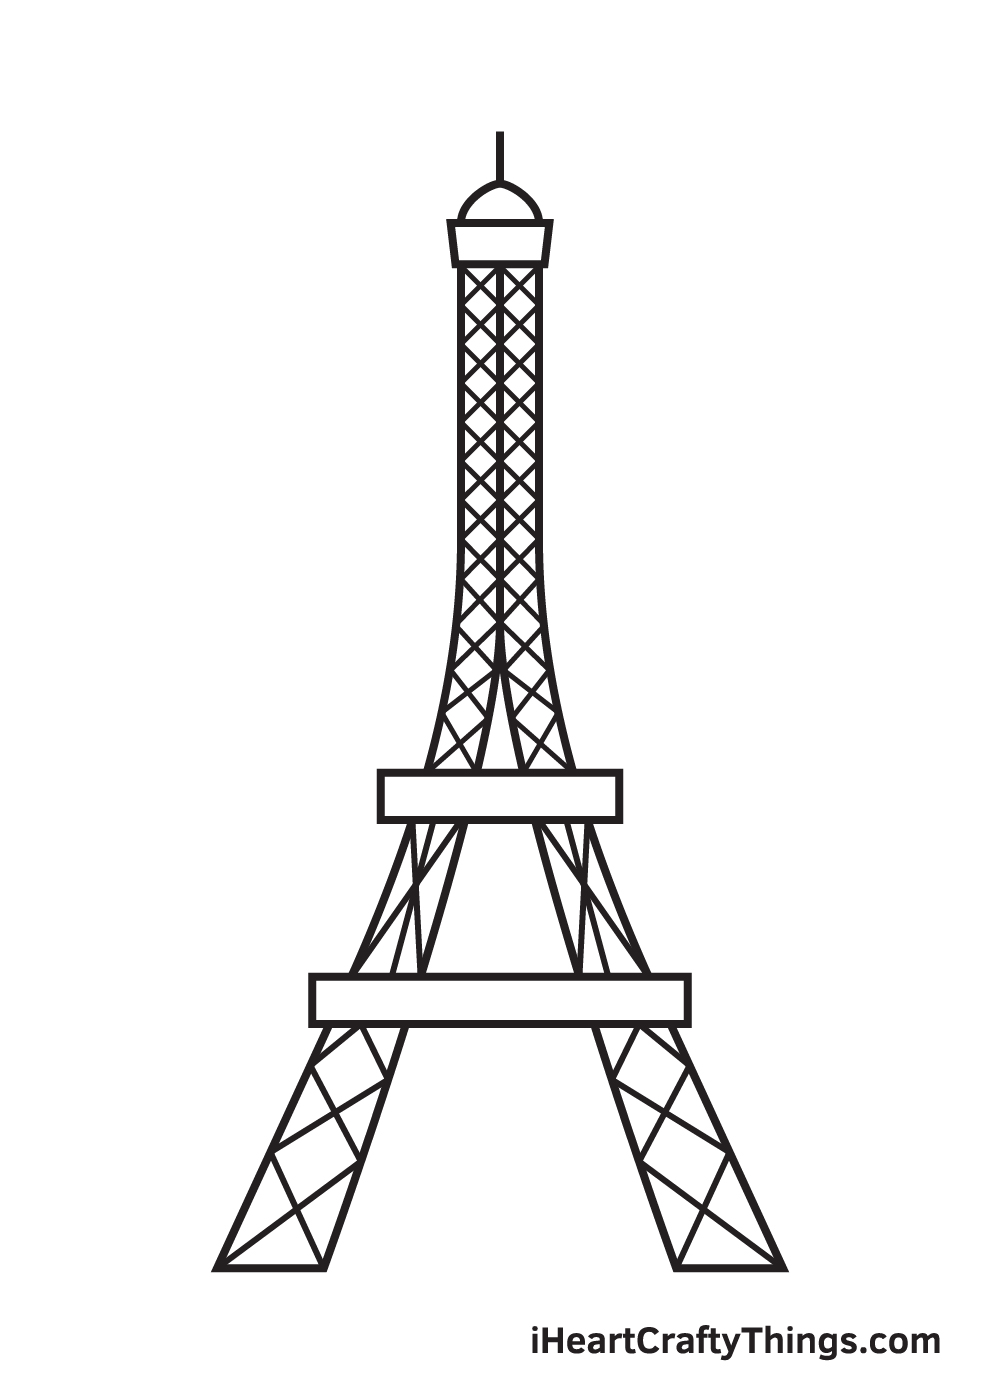 Eiffel Tower drawing - step 8